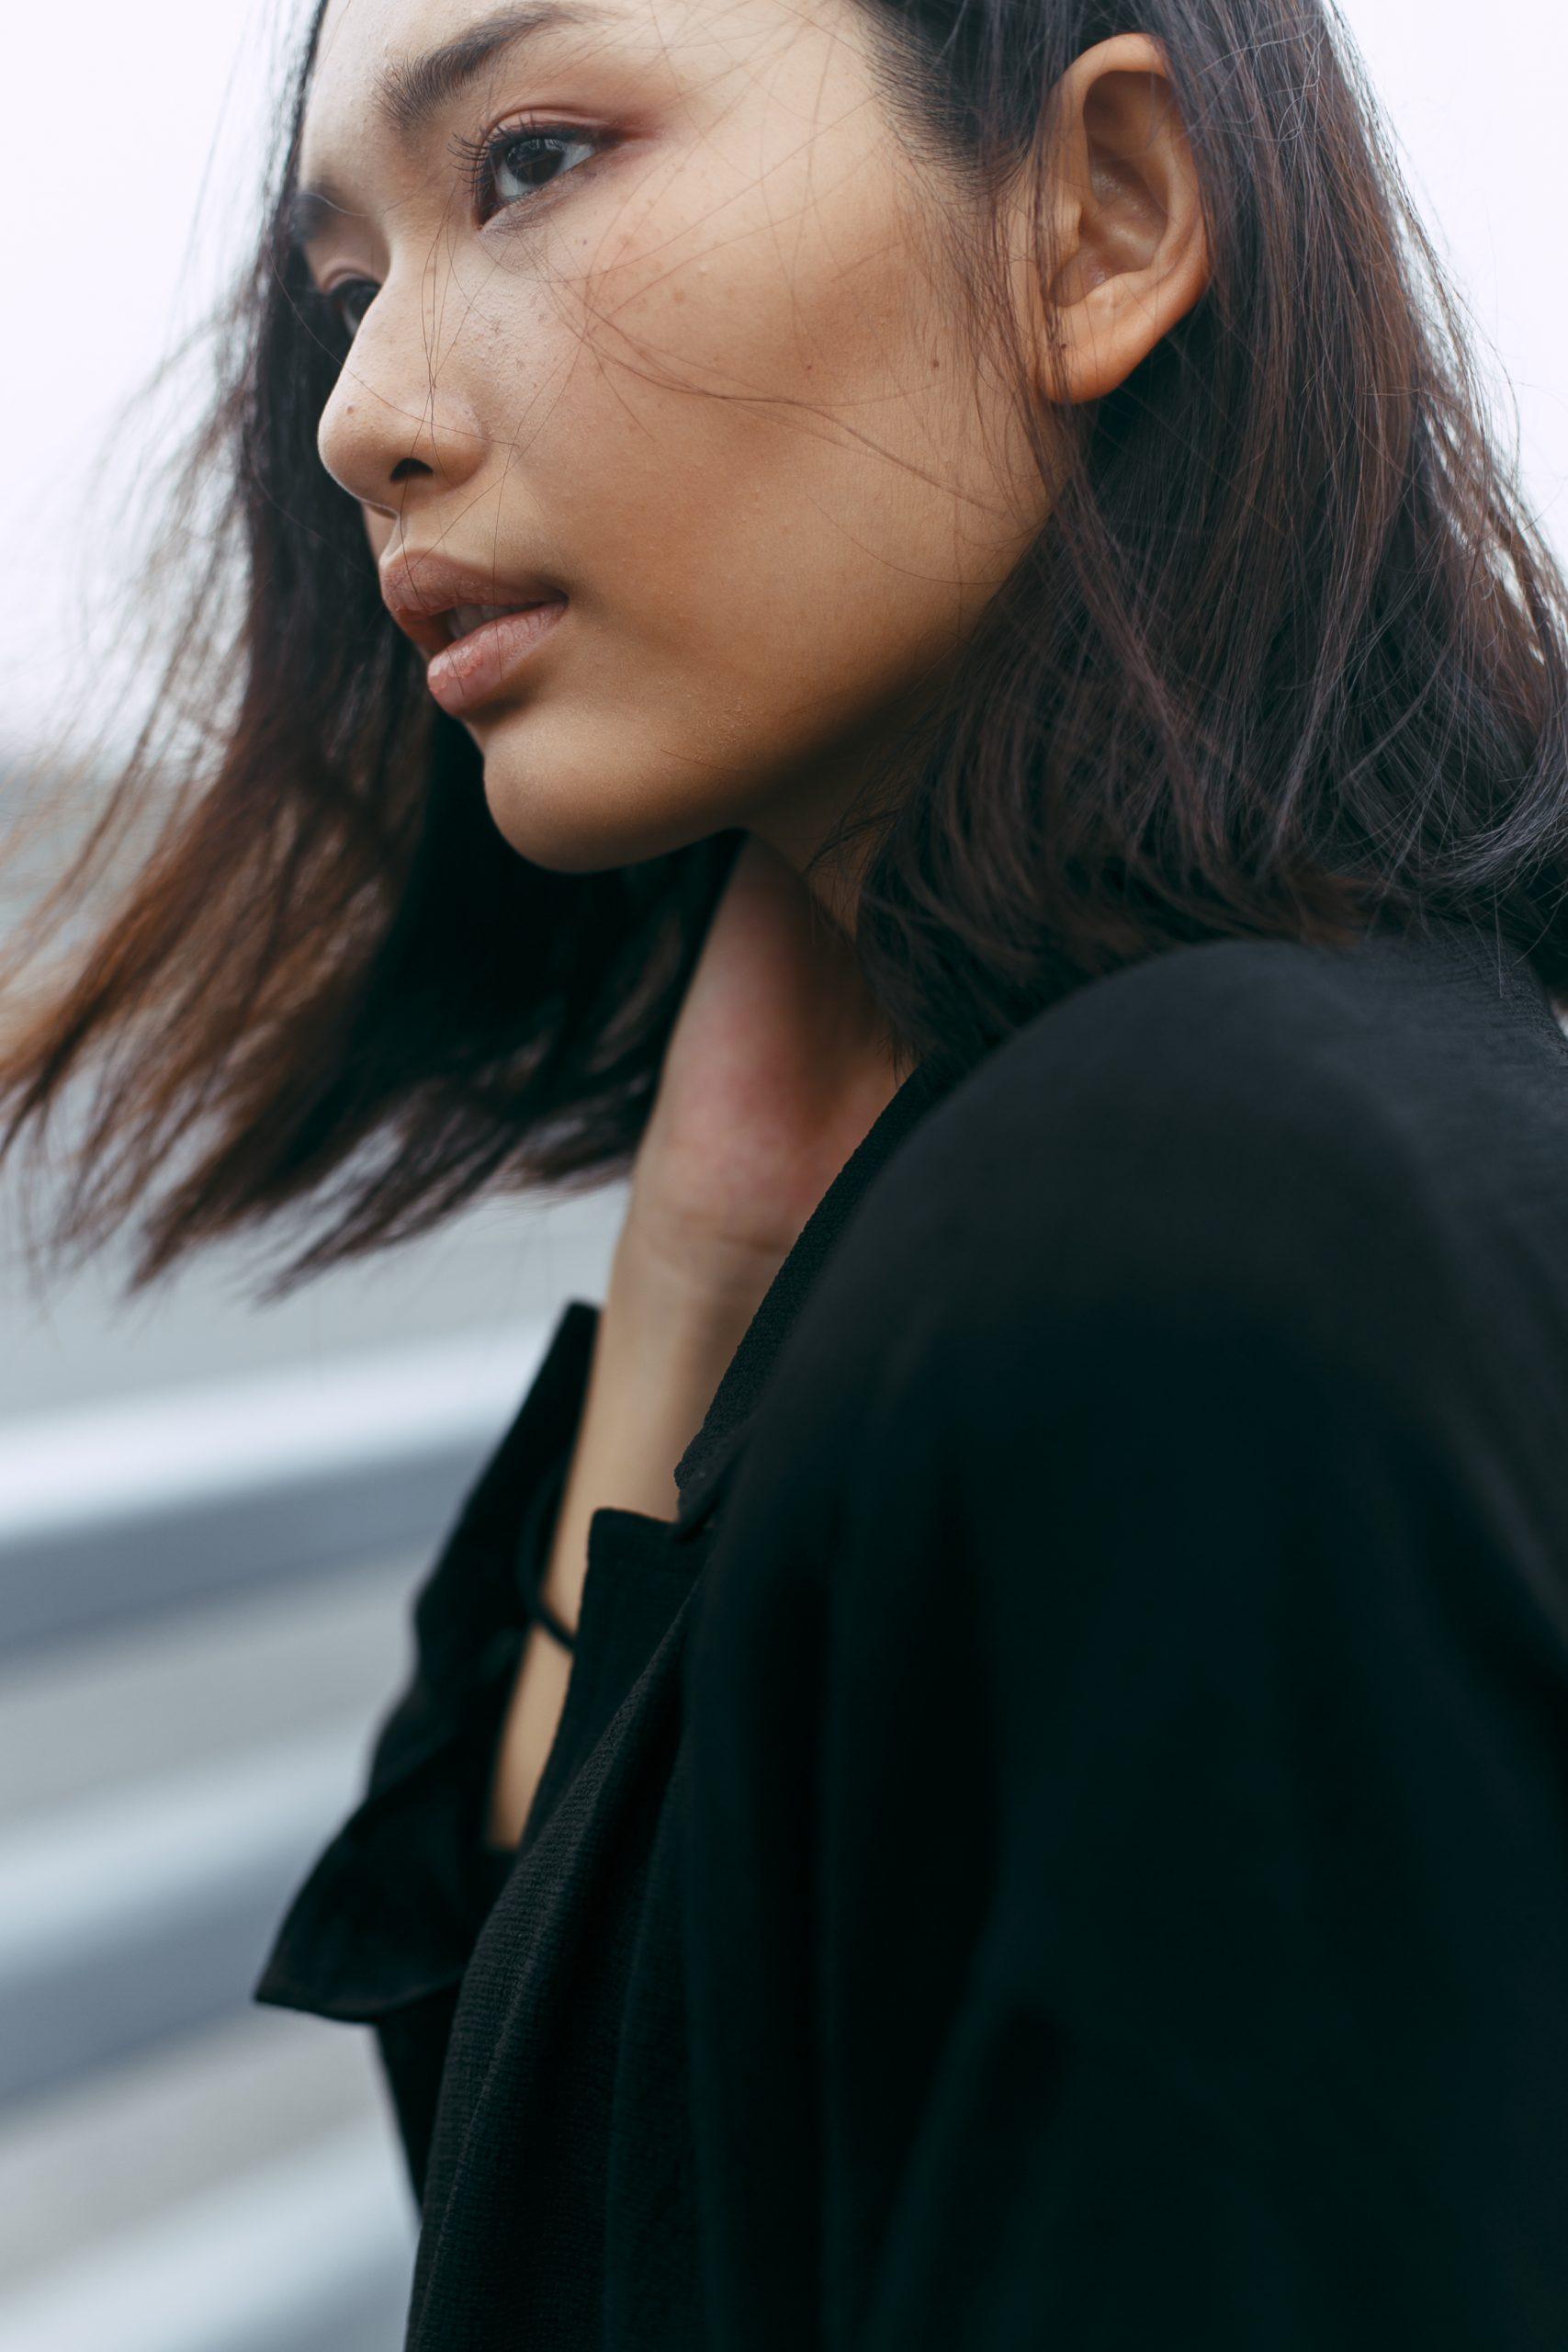 Representative image of young female Thai survivor.